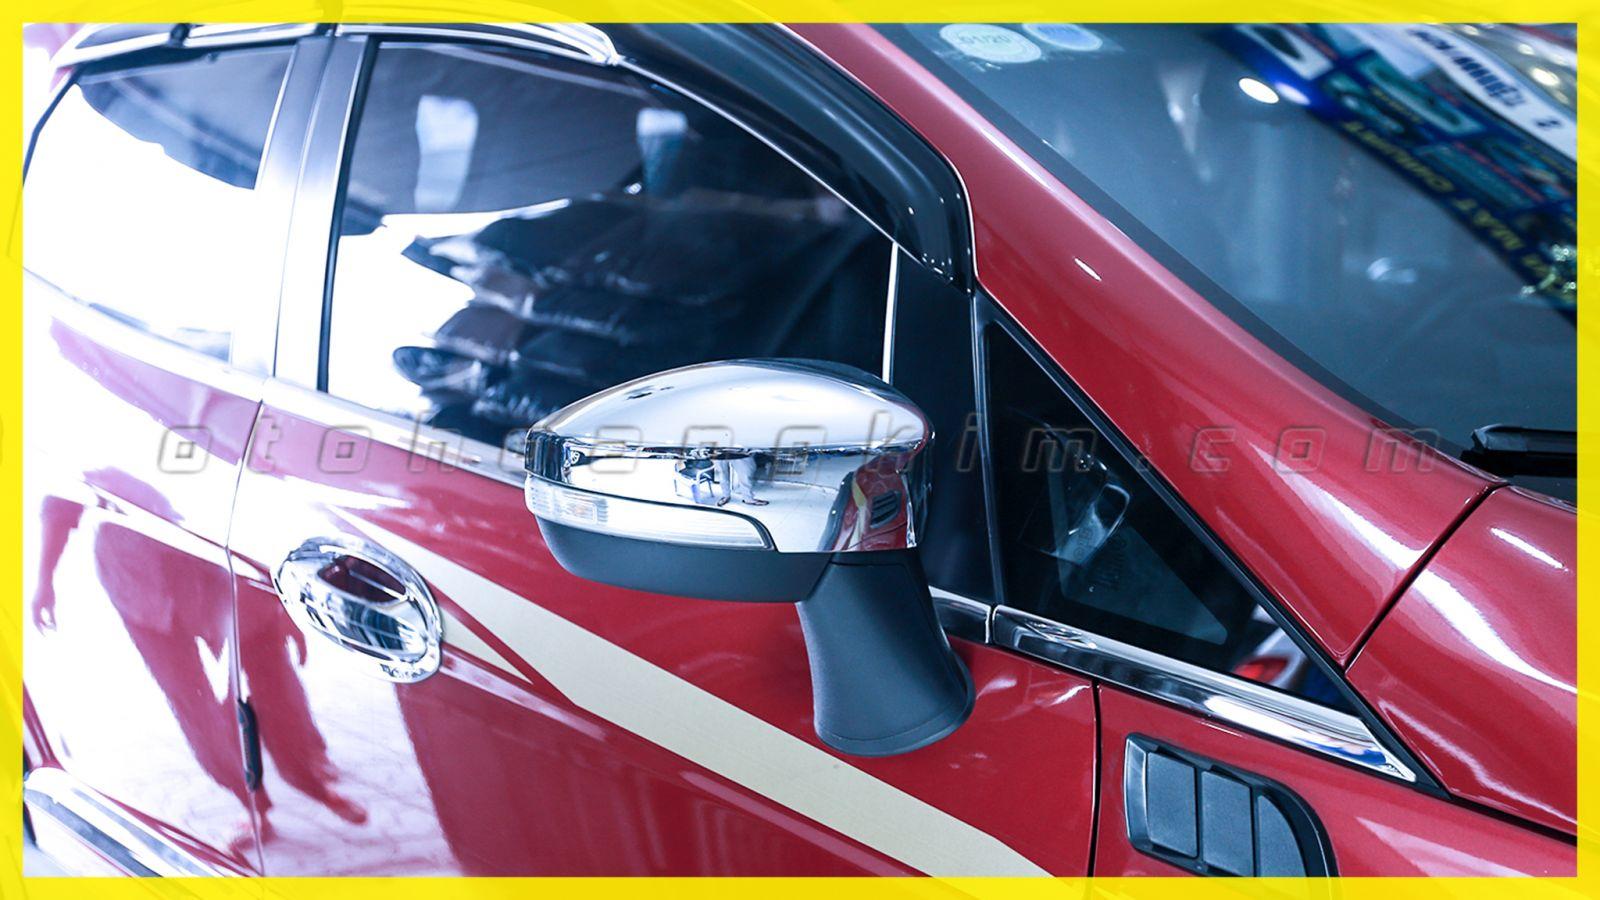 Ốp gương chiếu hậu Ford Ecosport